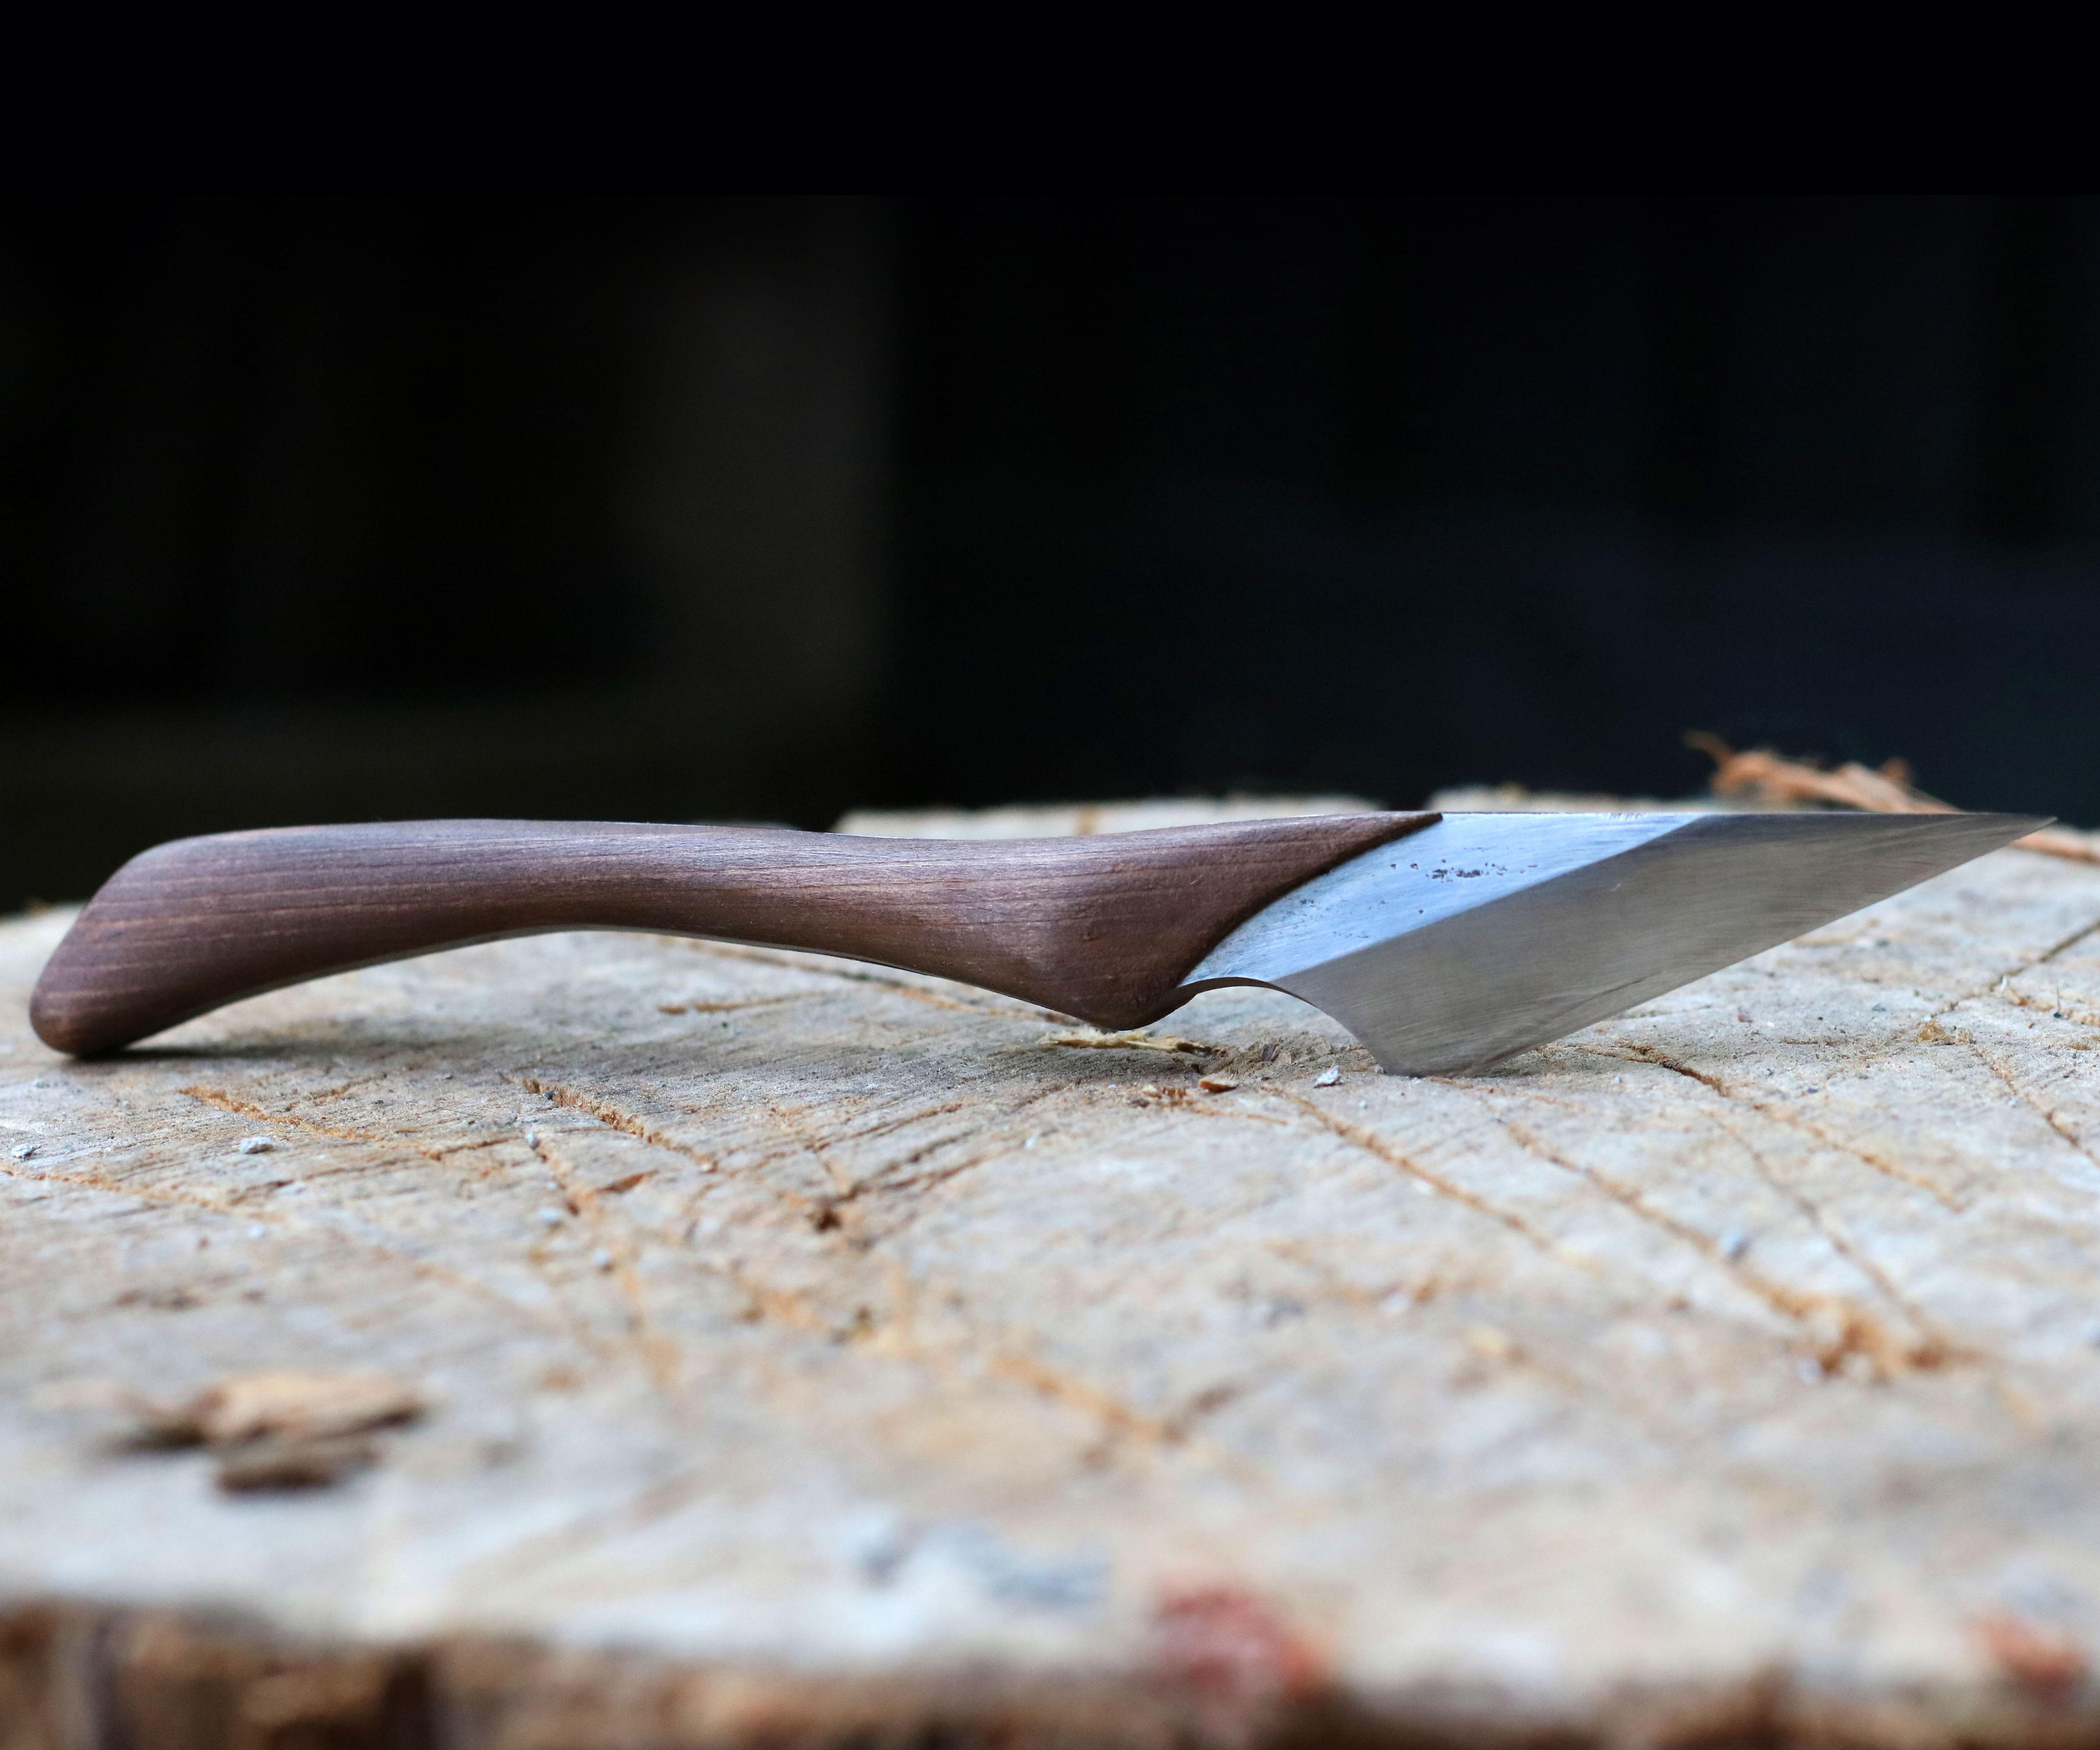 How to Make Kiridashi Style Utility Knife